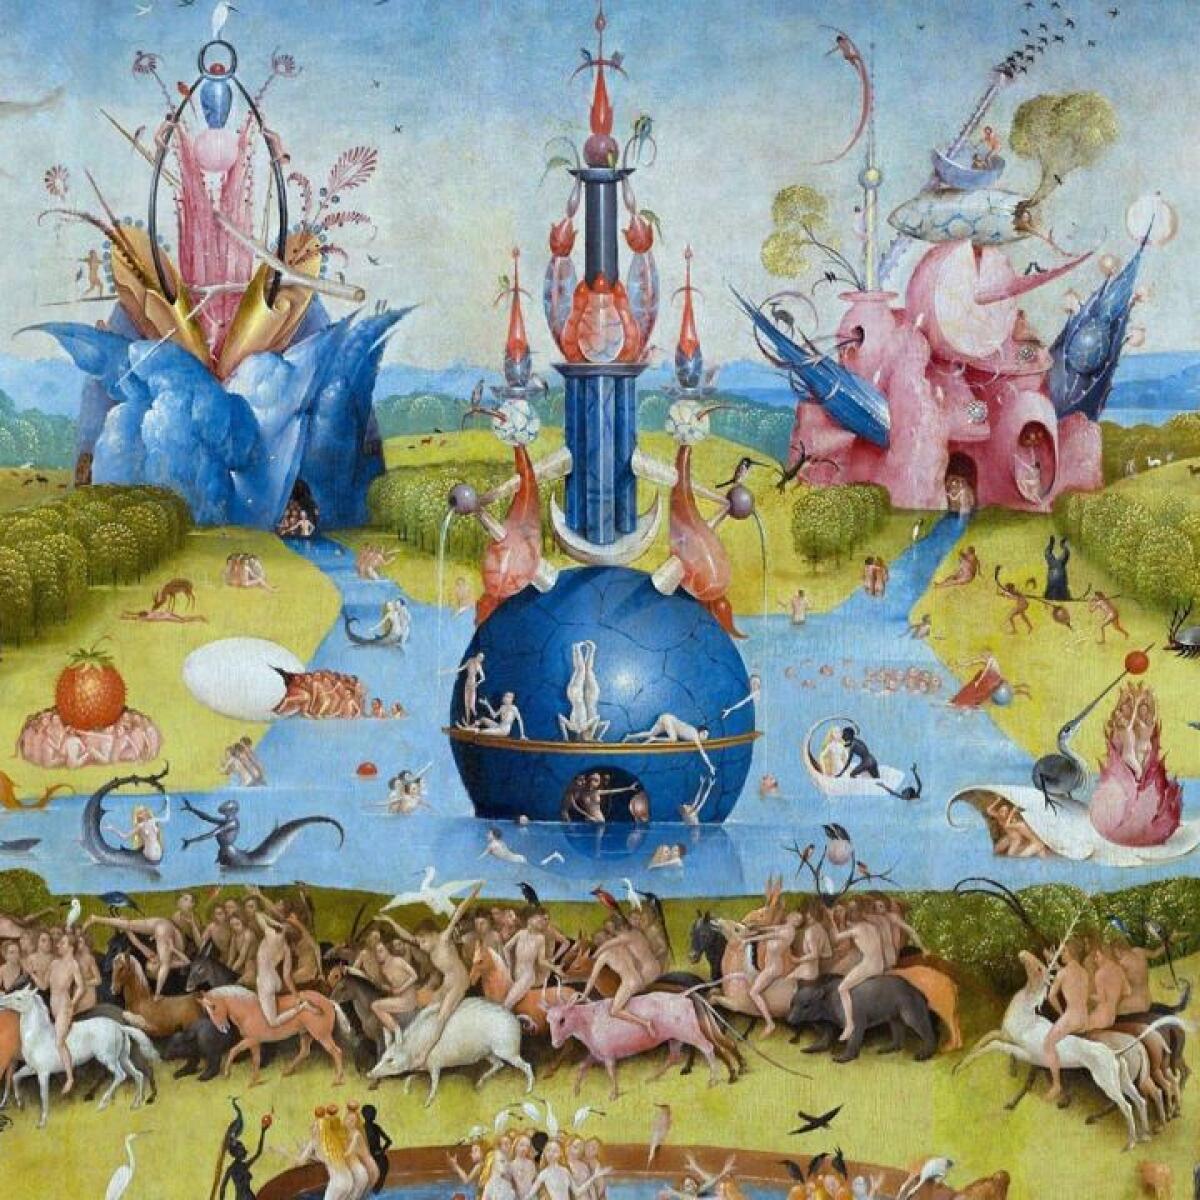 2e7c7a82f1e Hieronymus Bosch s  The Garden of Earthly Delights